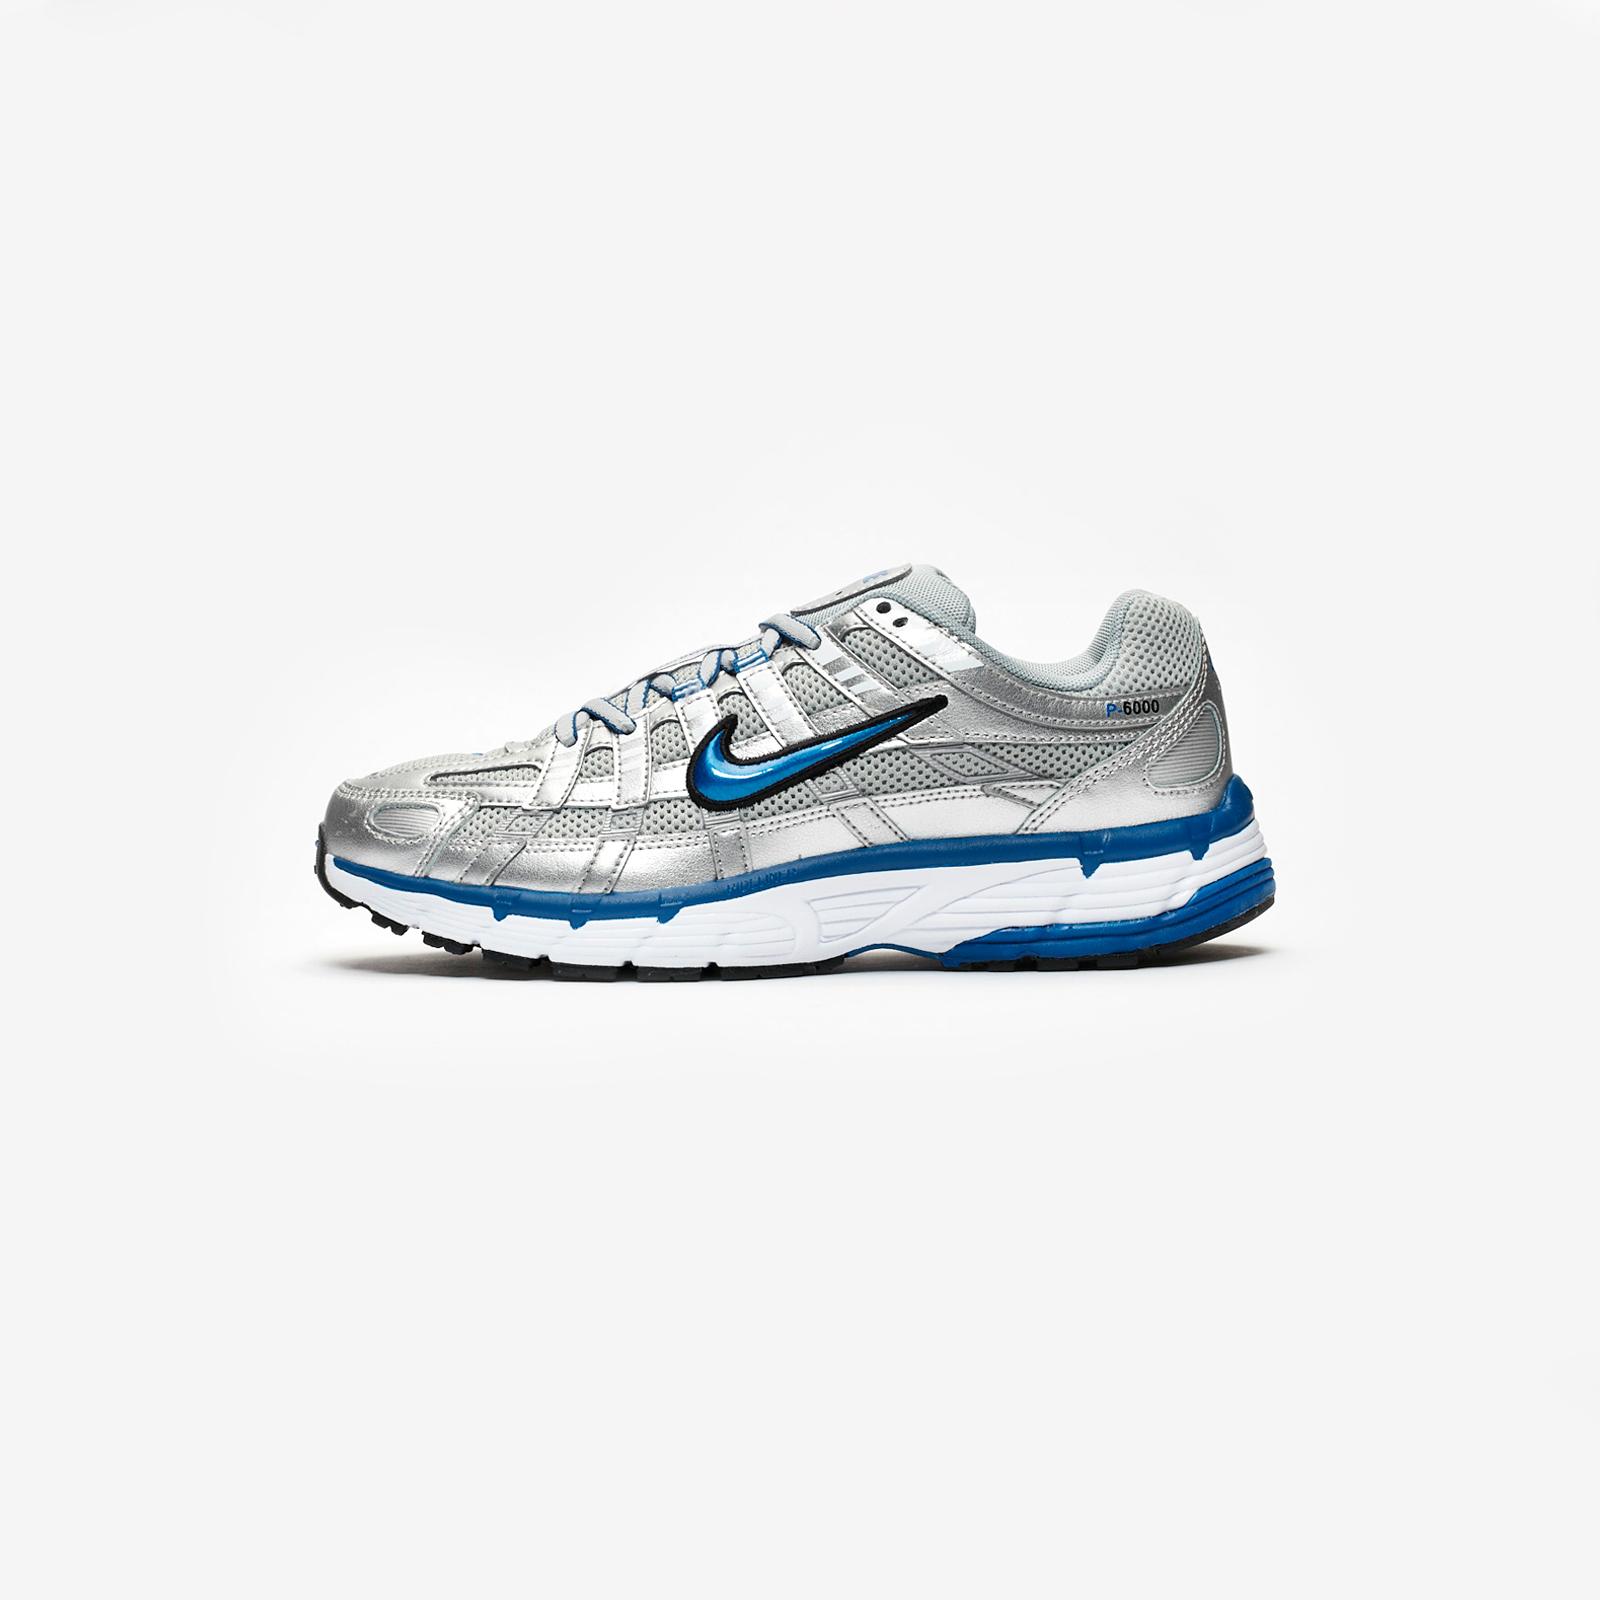 low priced 4a07b 6627b Nike Wmns P-6000 - Bv1021-001 - Sneakersnstuff   sneakers   streetwear  online since 1999